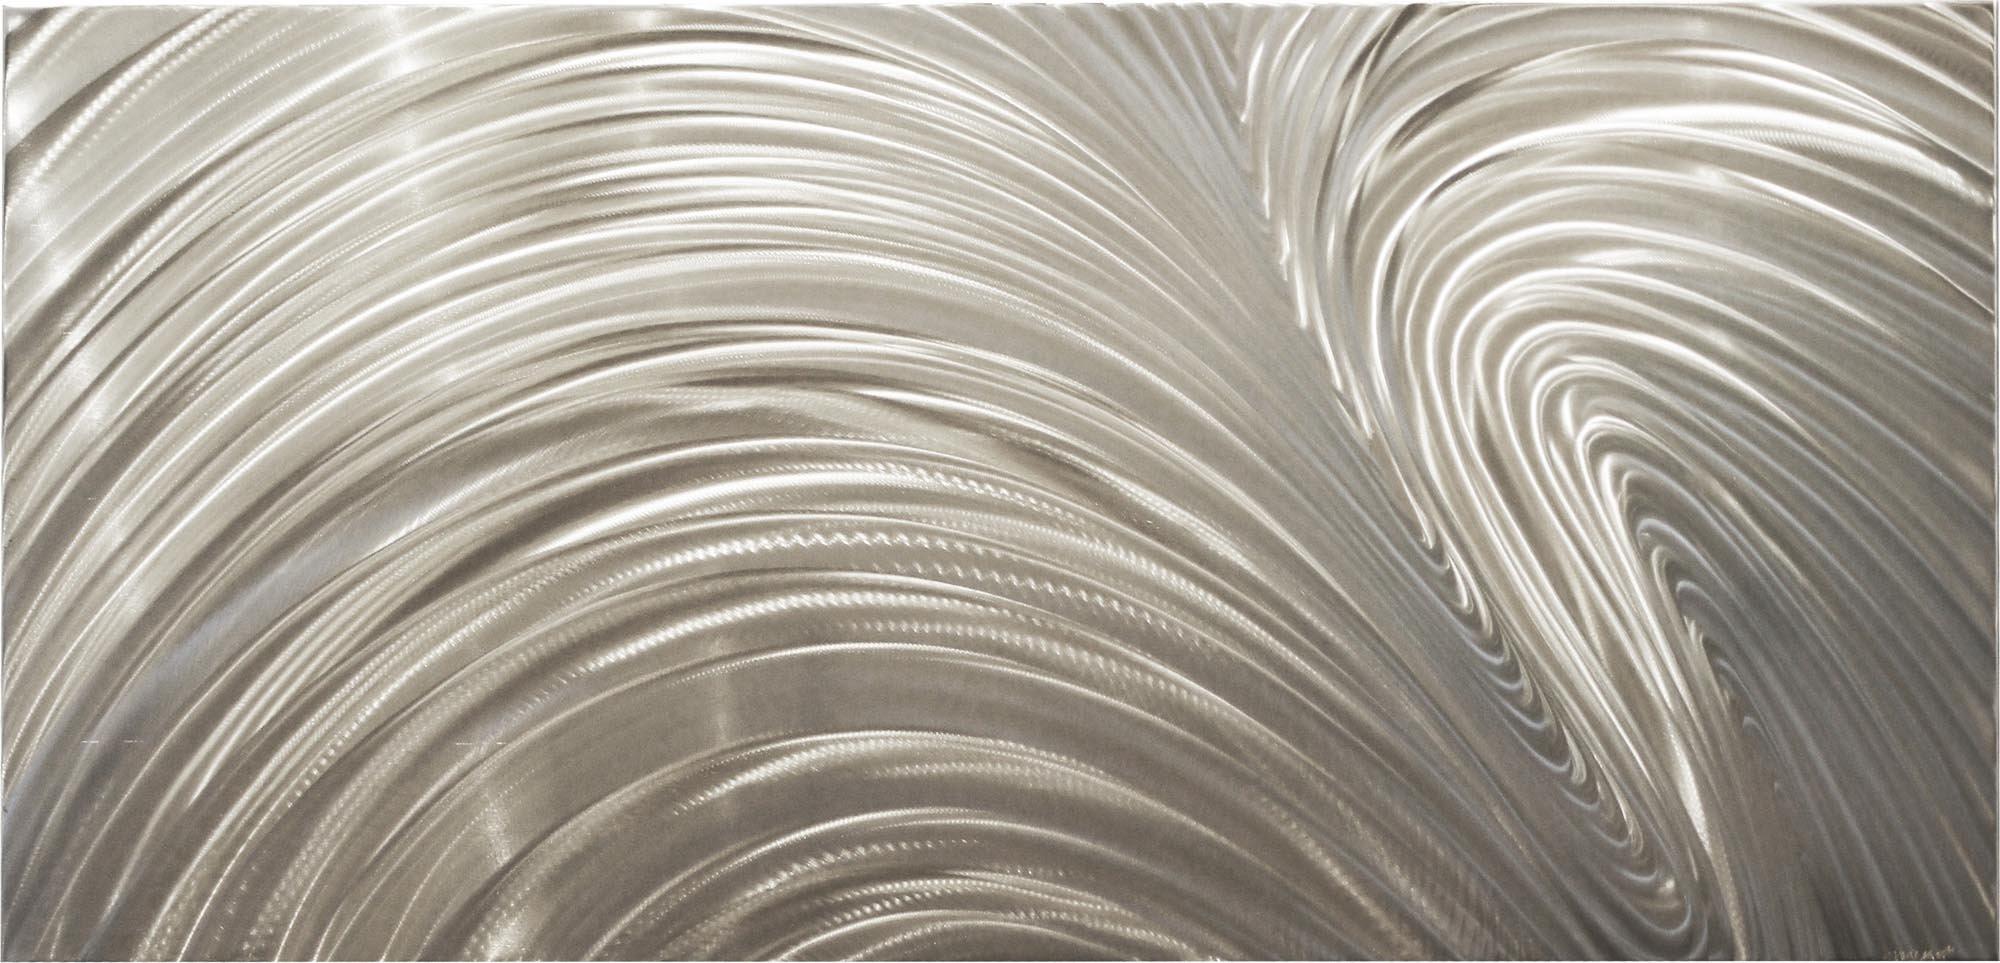 Fusion - Original Metal Art Abstract Metallic Painting Contemporary Wall Sculpture Modern Interior Design by Renowned Artist Nicholas Yust